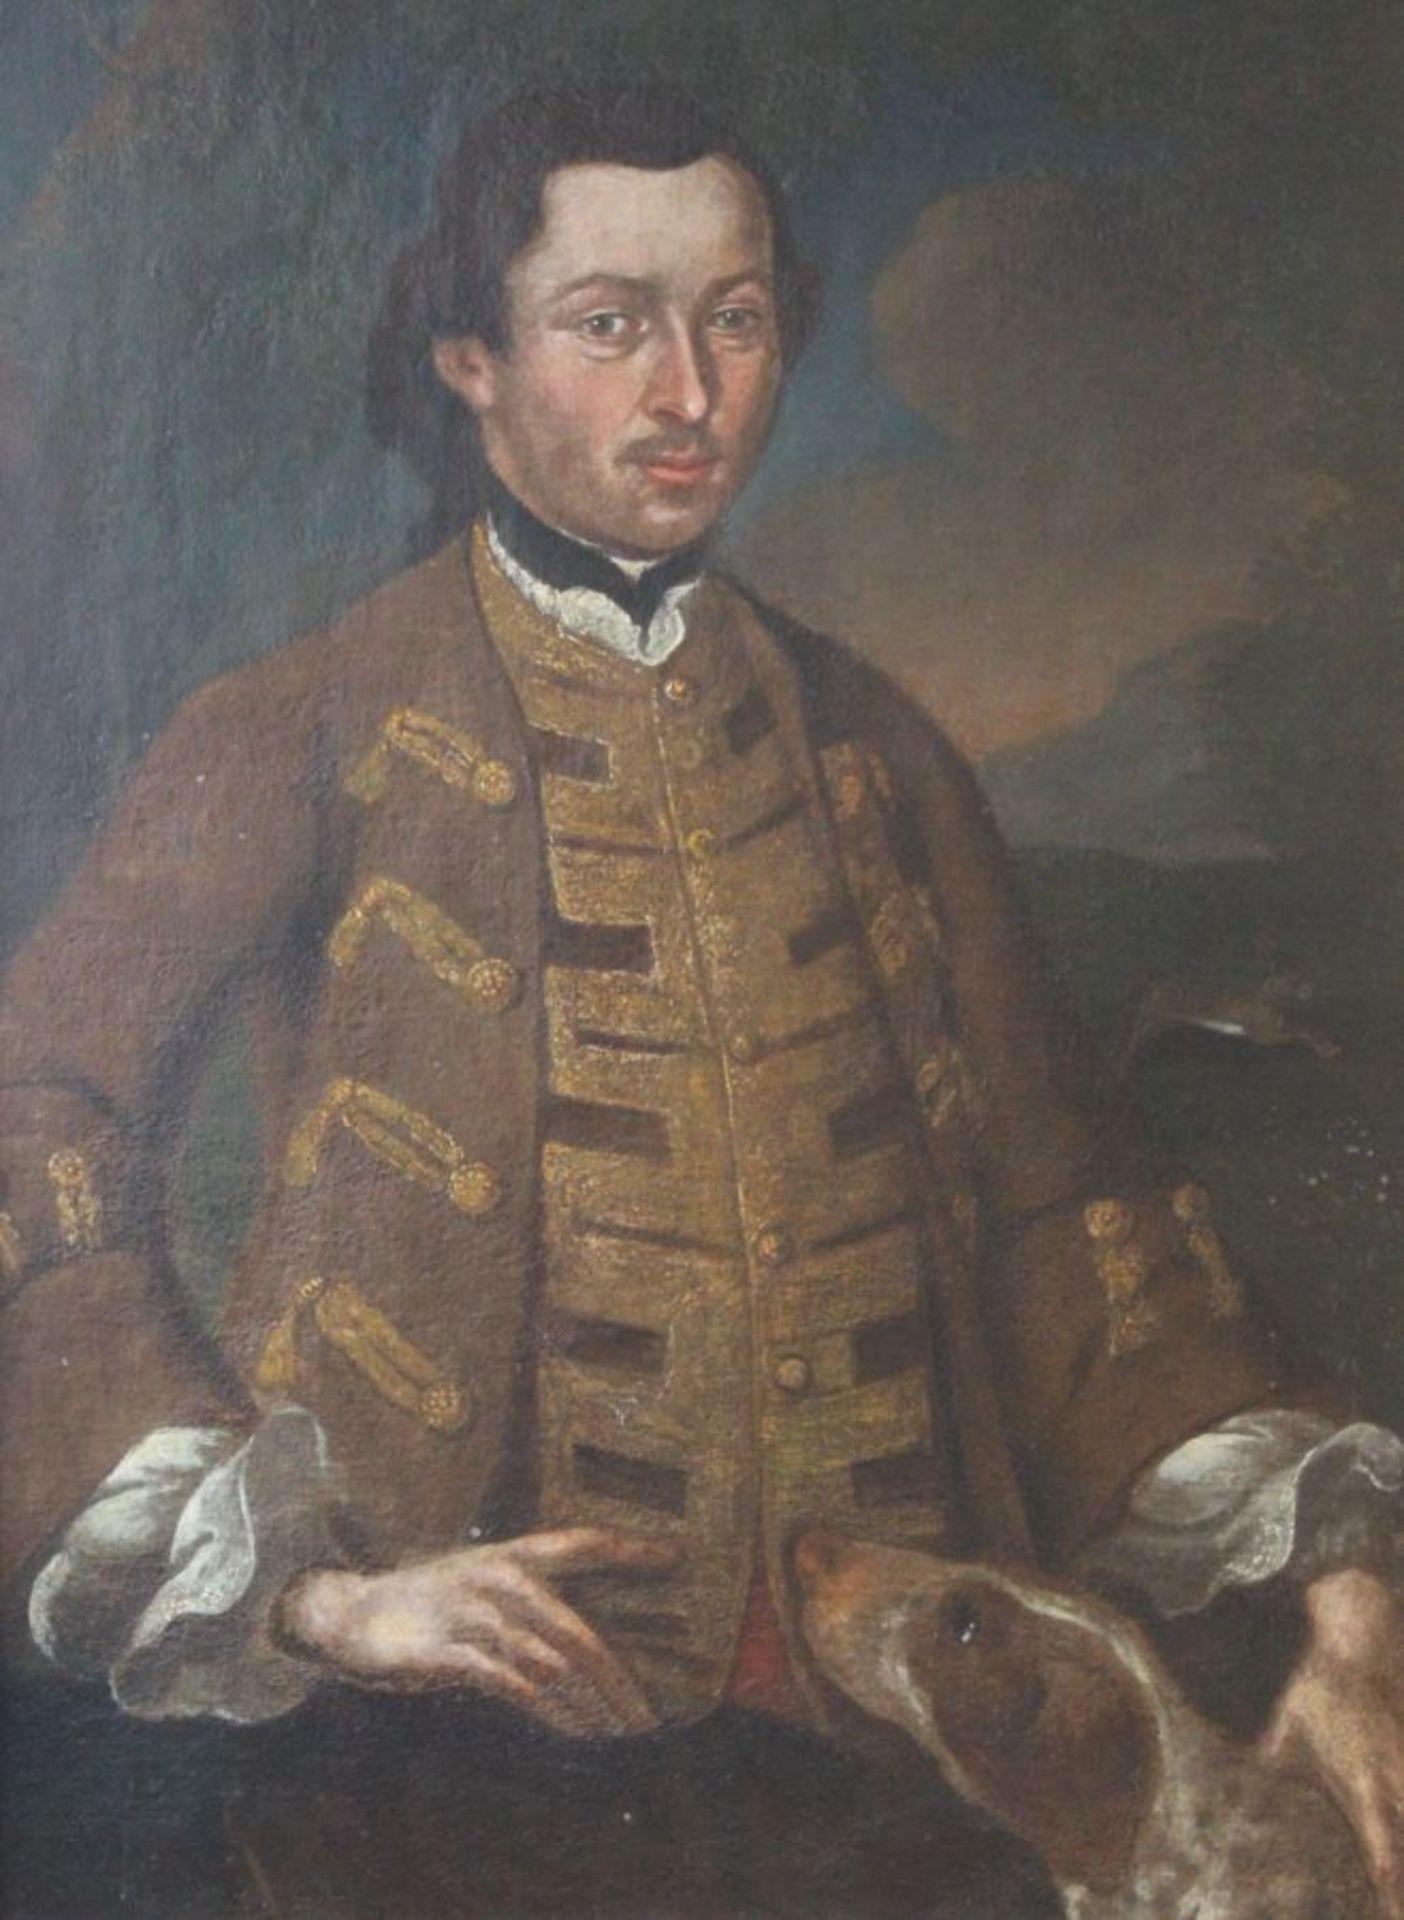 "Los 46 - Gemälde - Barock 18.Jahrhundert ""Adeliger mit Jagdhund"", anonymer Künstler, Öl auf Leinwand, rest."